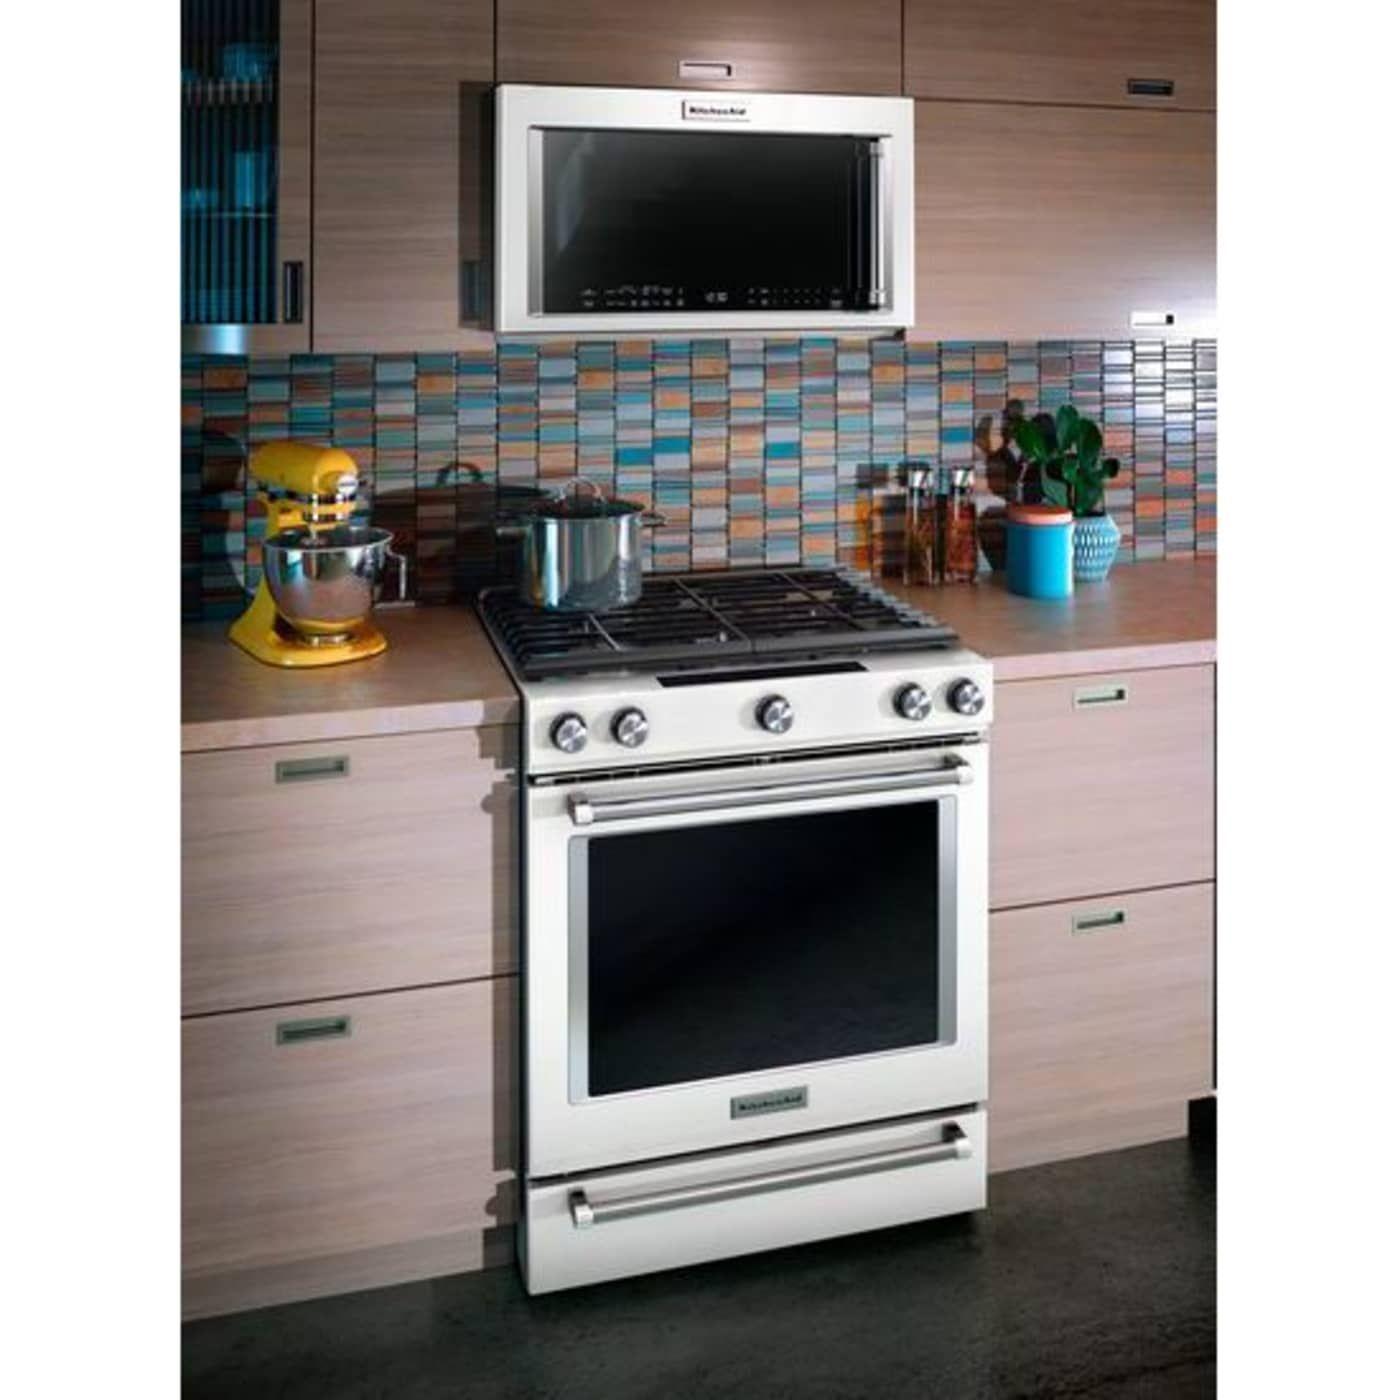 Kmhc319ewh by kitchenaid overtherange microwaves